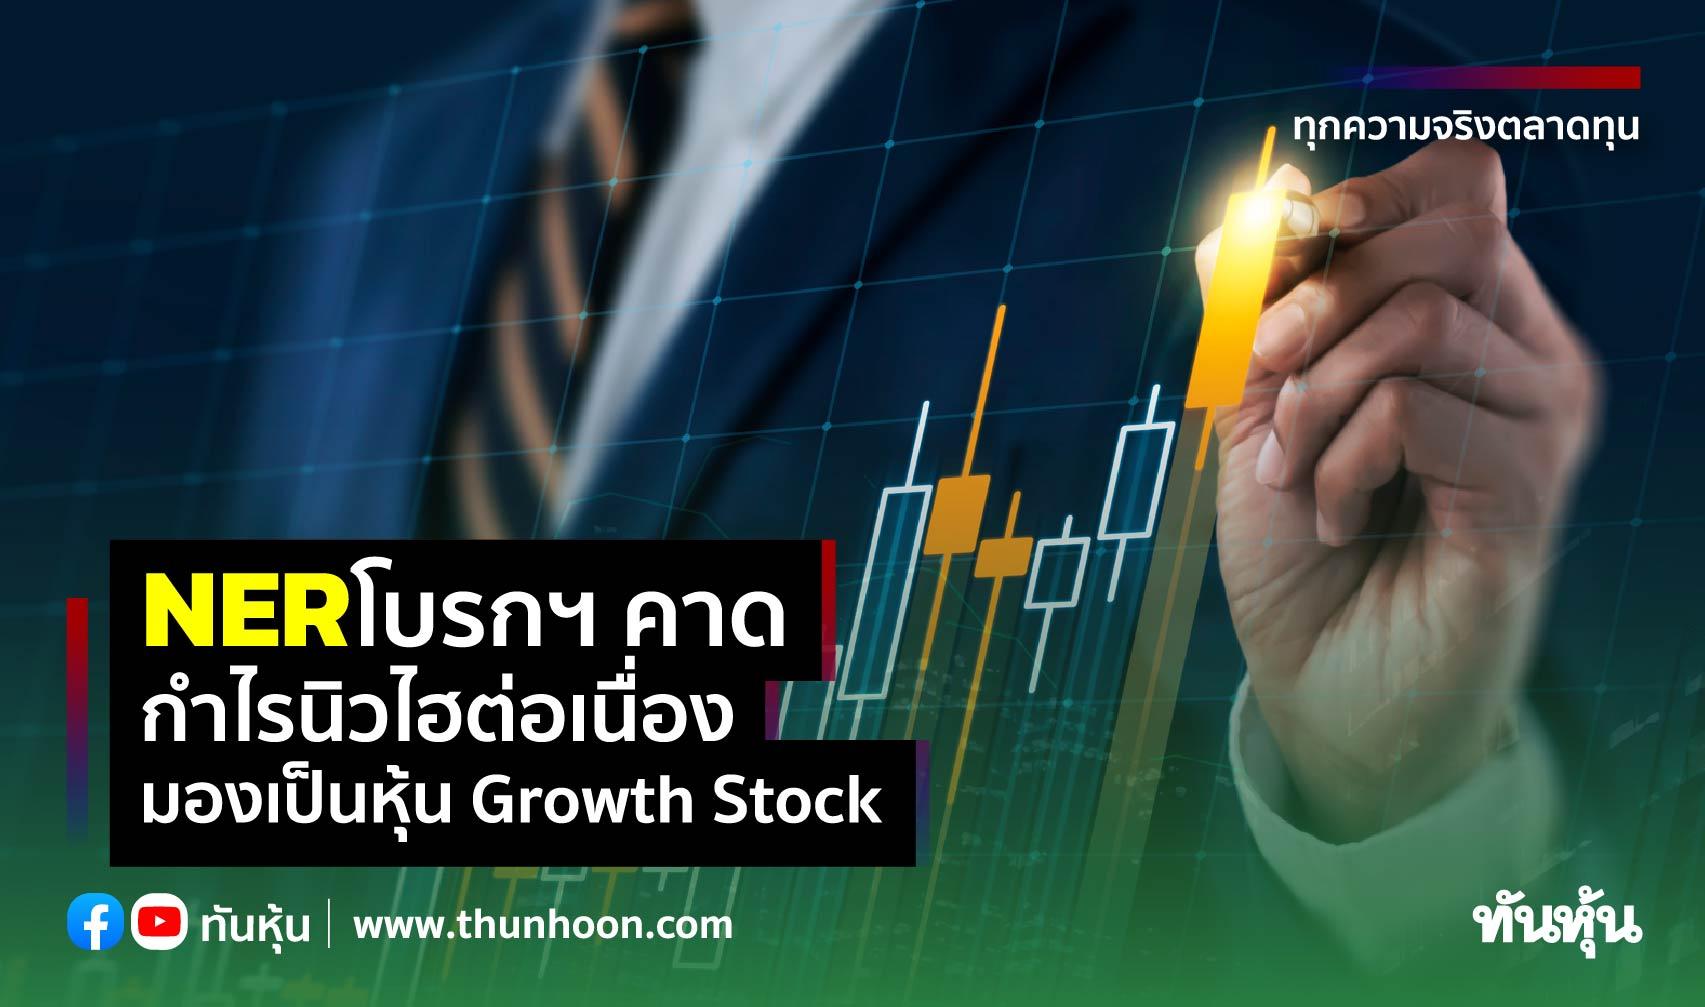 NER โบรกฯ คาดกำไรนิวไฮต่อเนื่อง, มองเป็นหุ้น Growth Stock